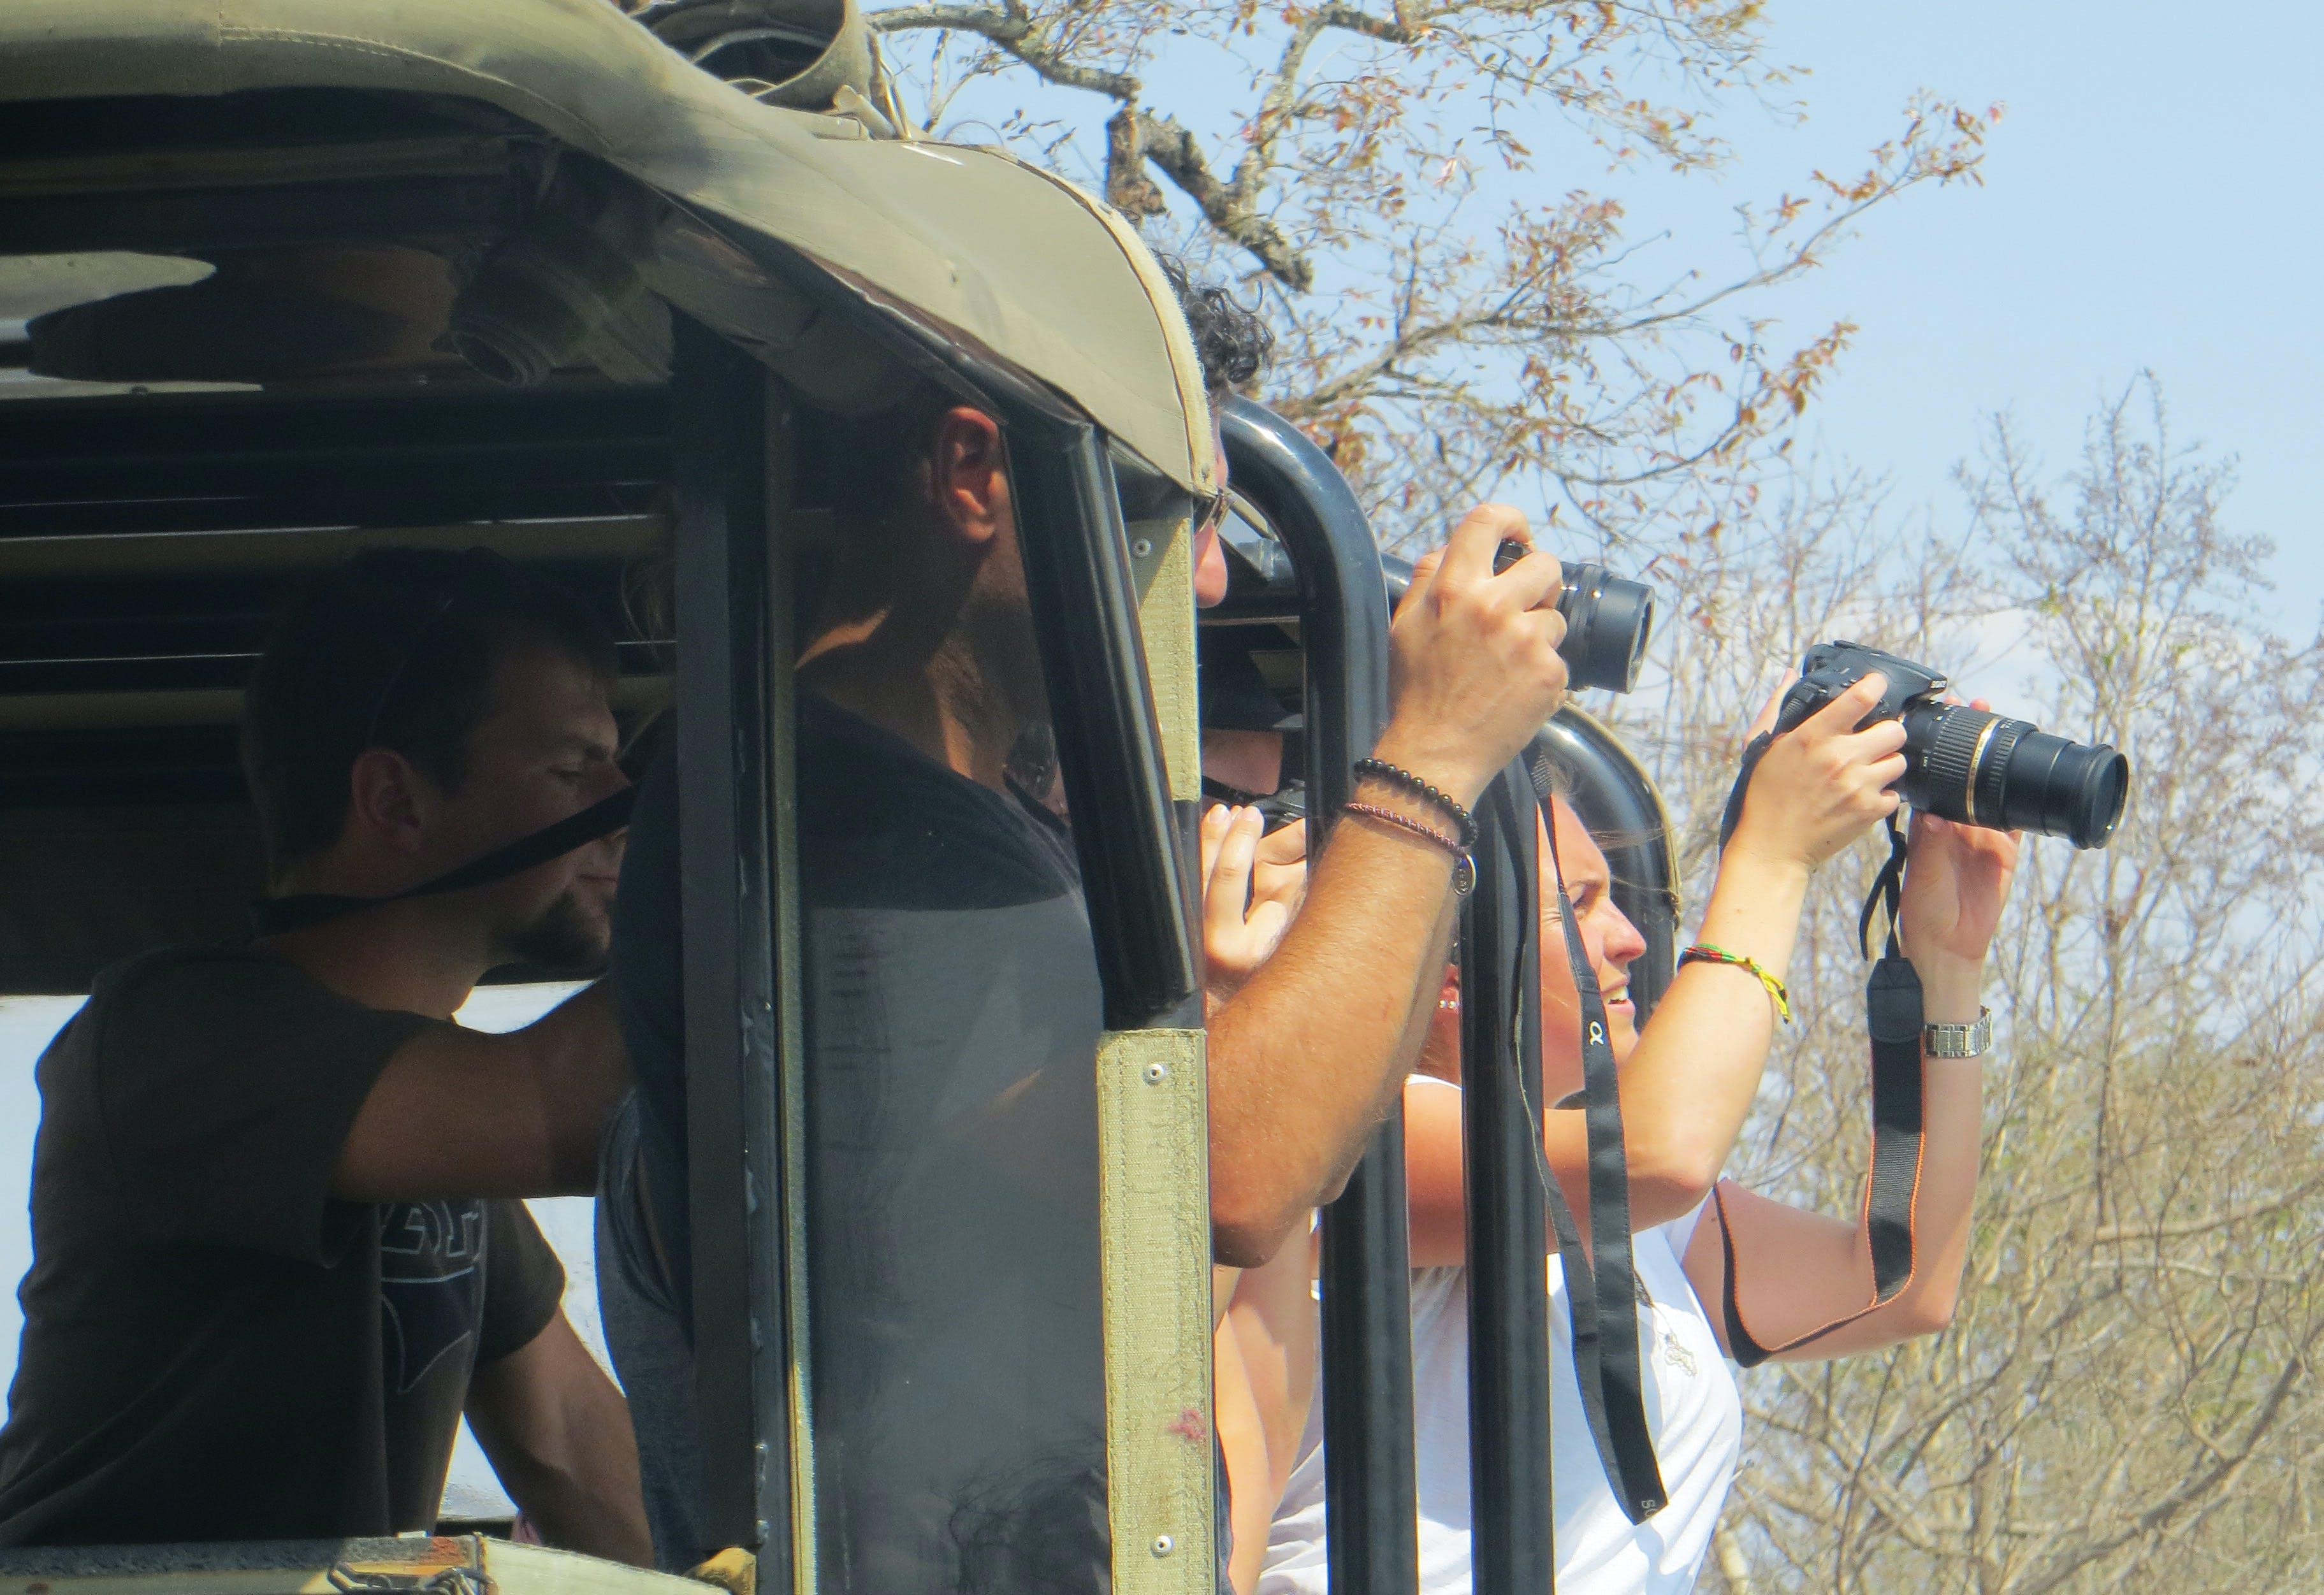 Free stock photo of tourists, cameras, safari, photos